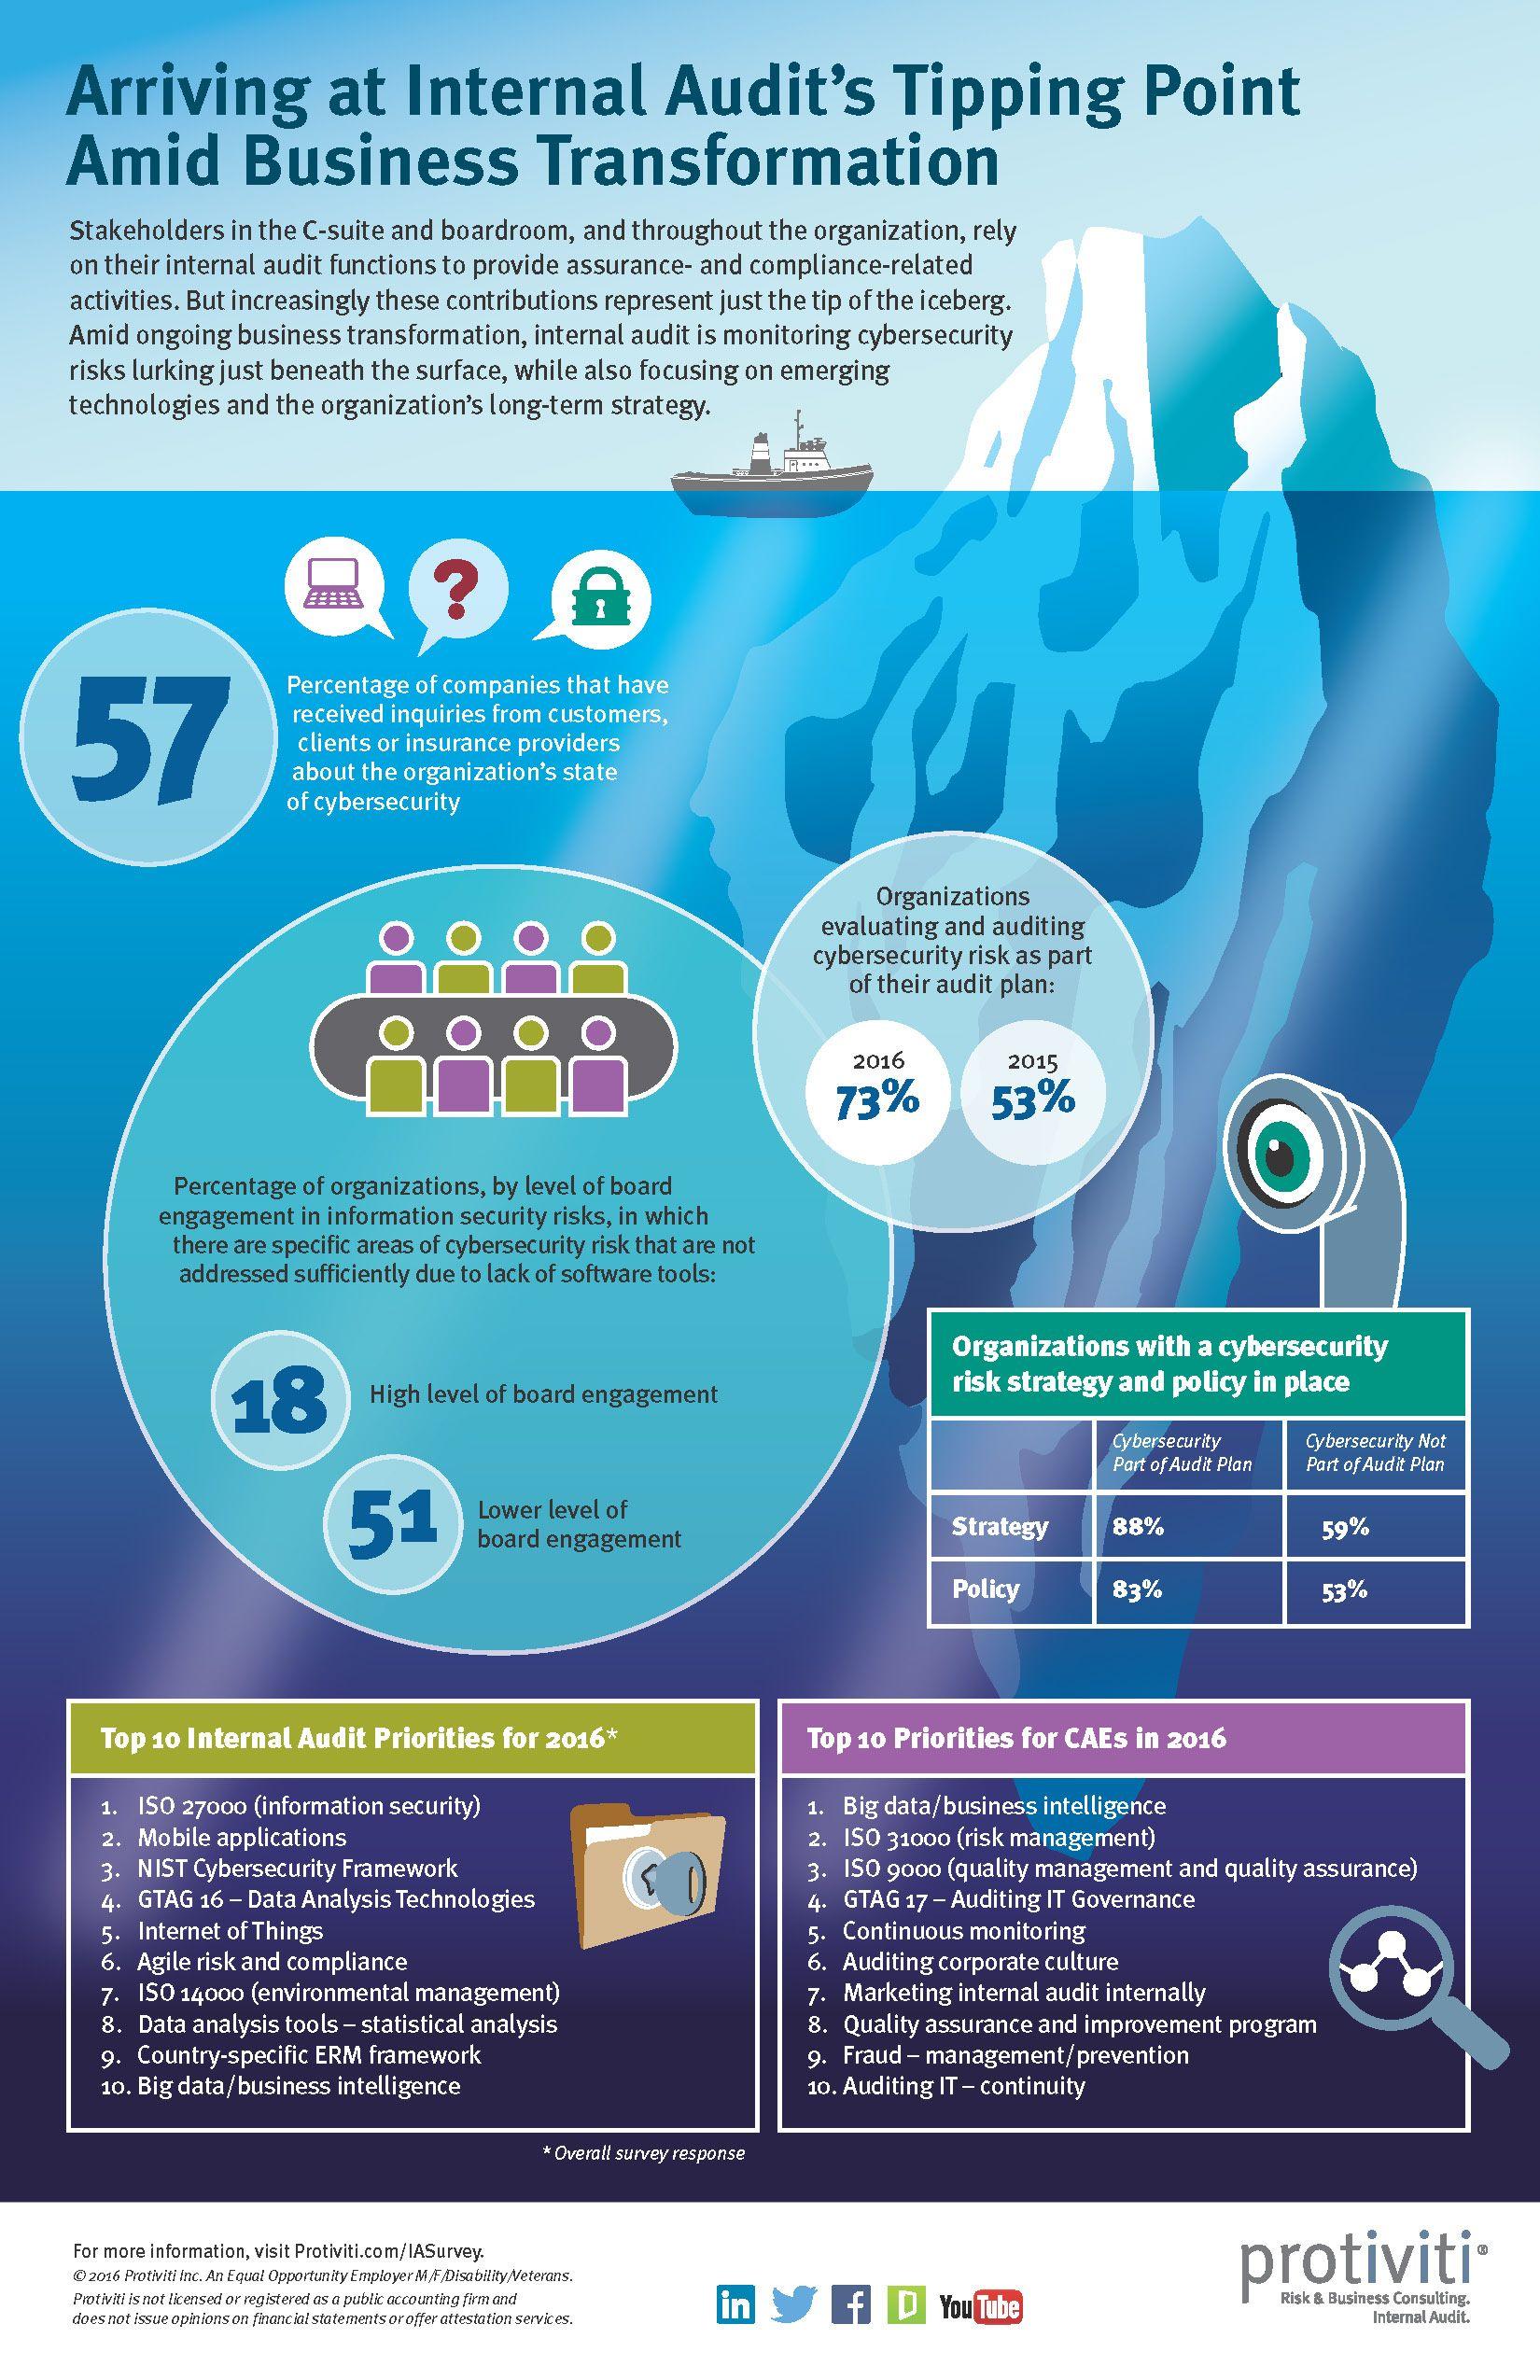 New Protiviti survey shows cybersecurity and technology risks rank